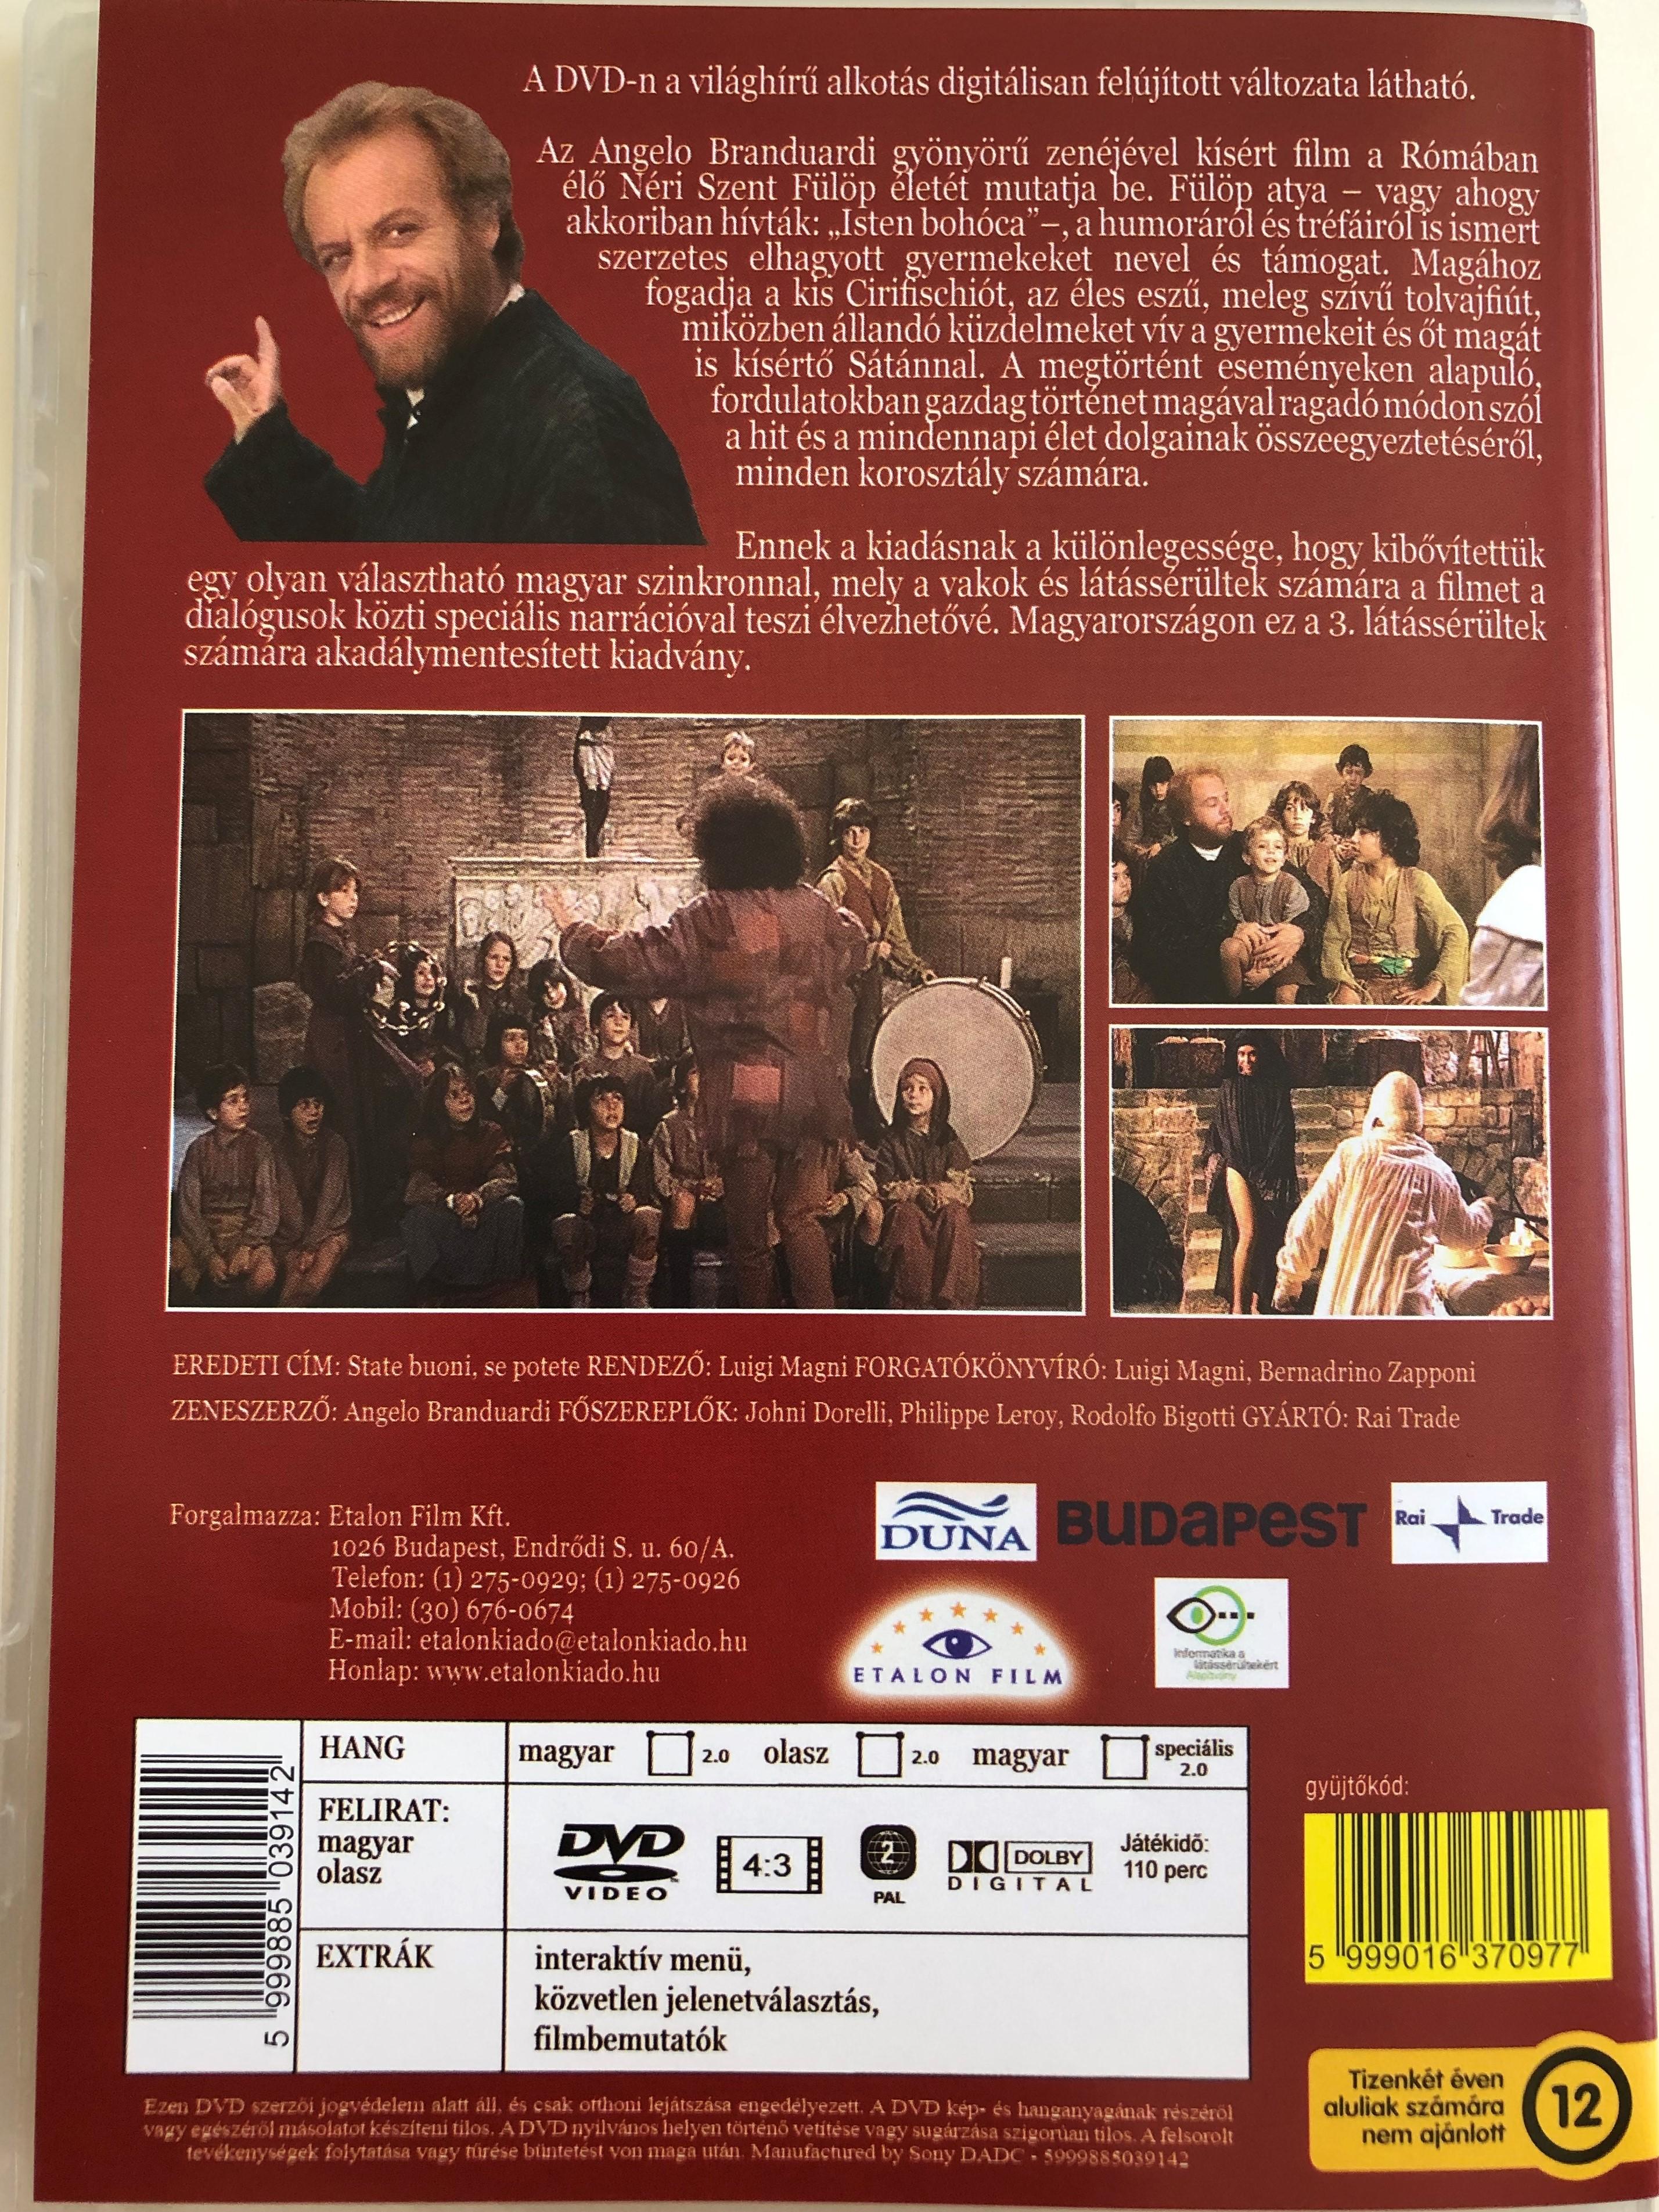 legyetek-j-k-ha-tudtok-dvd-1983-state-buoni-se-potete-directed-by-luigi-magni-starring-johnny-dorelli-mario-adorf-philippe-leroy-renzo-montagnani-2-.jpg